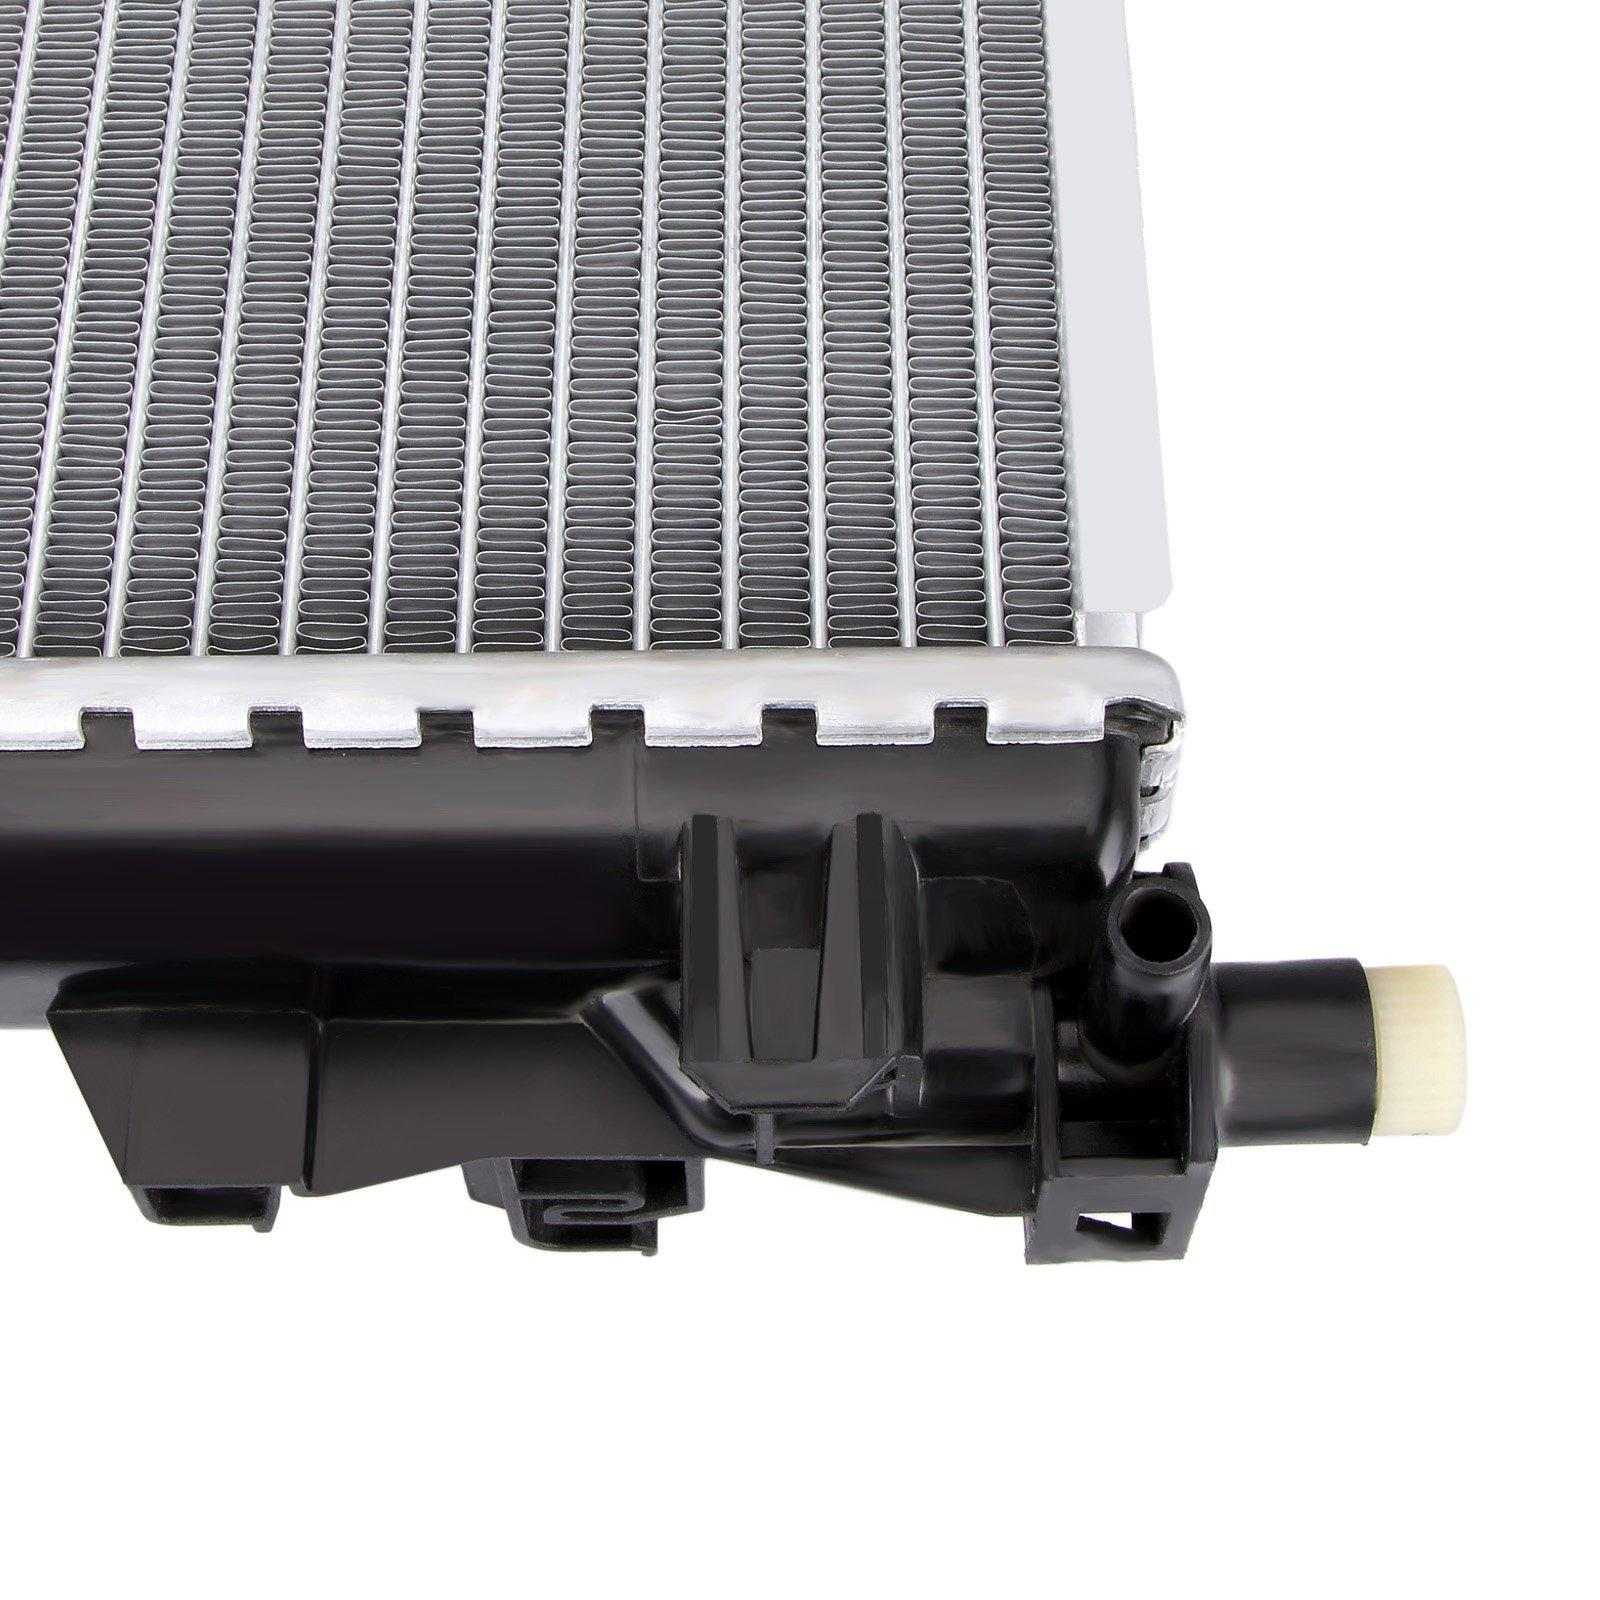 Dromedary Brand plastic 190 manual mercedes ml320 radiator